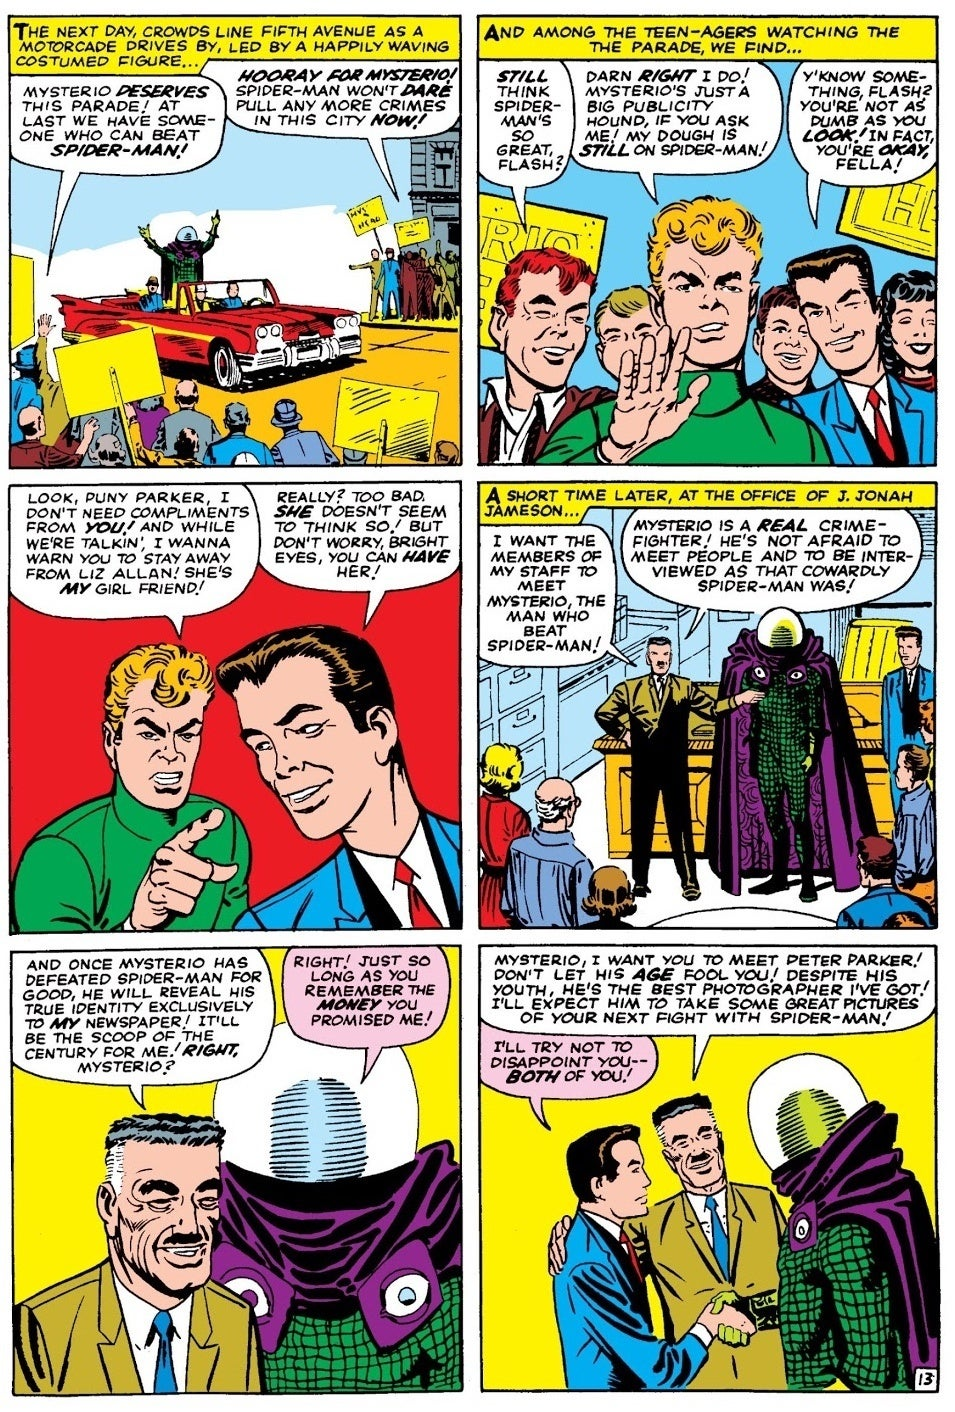 Amazing Spider-Man 13 Mysterio